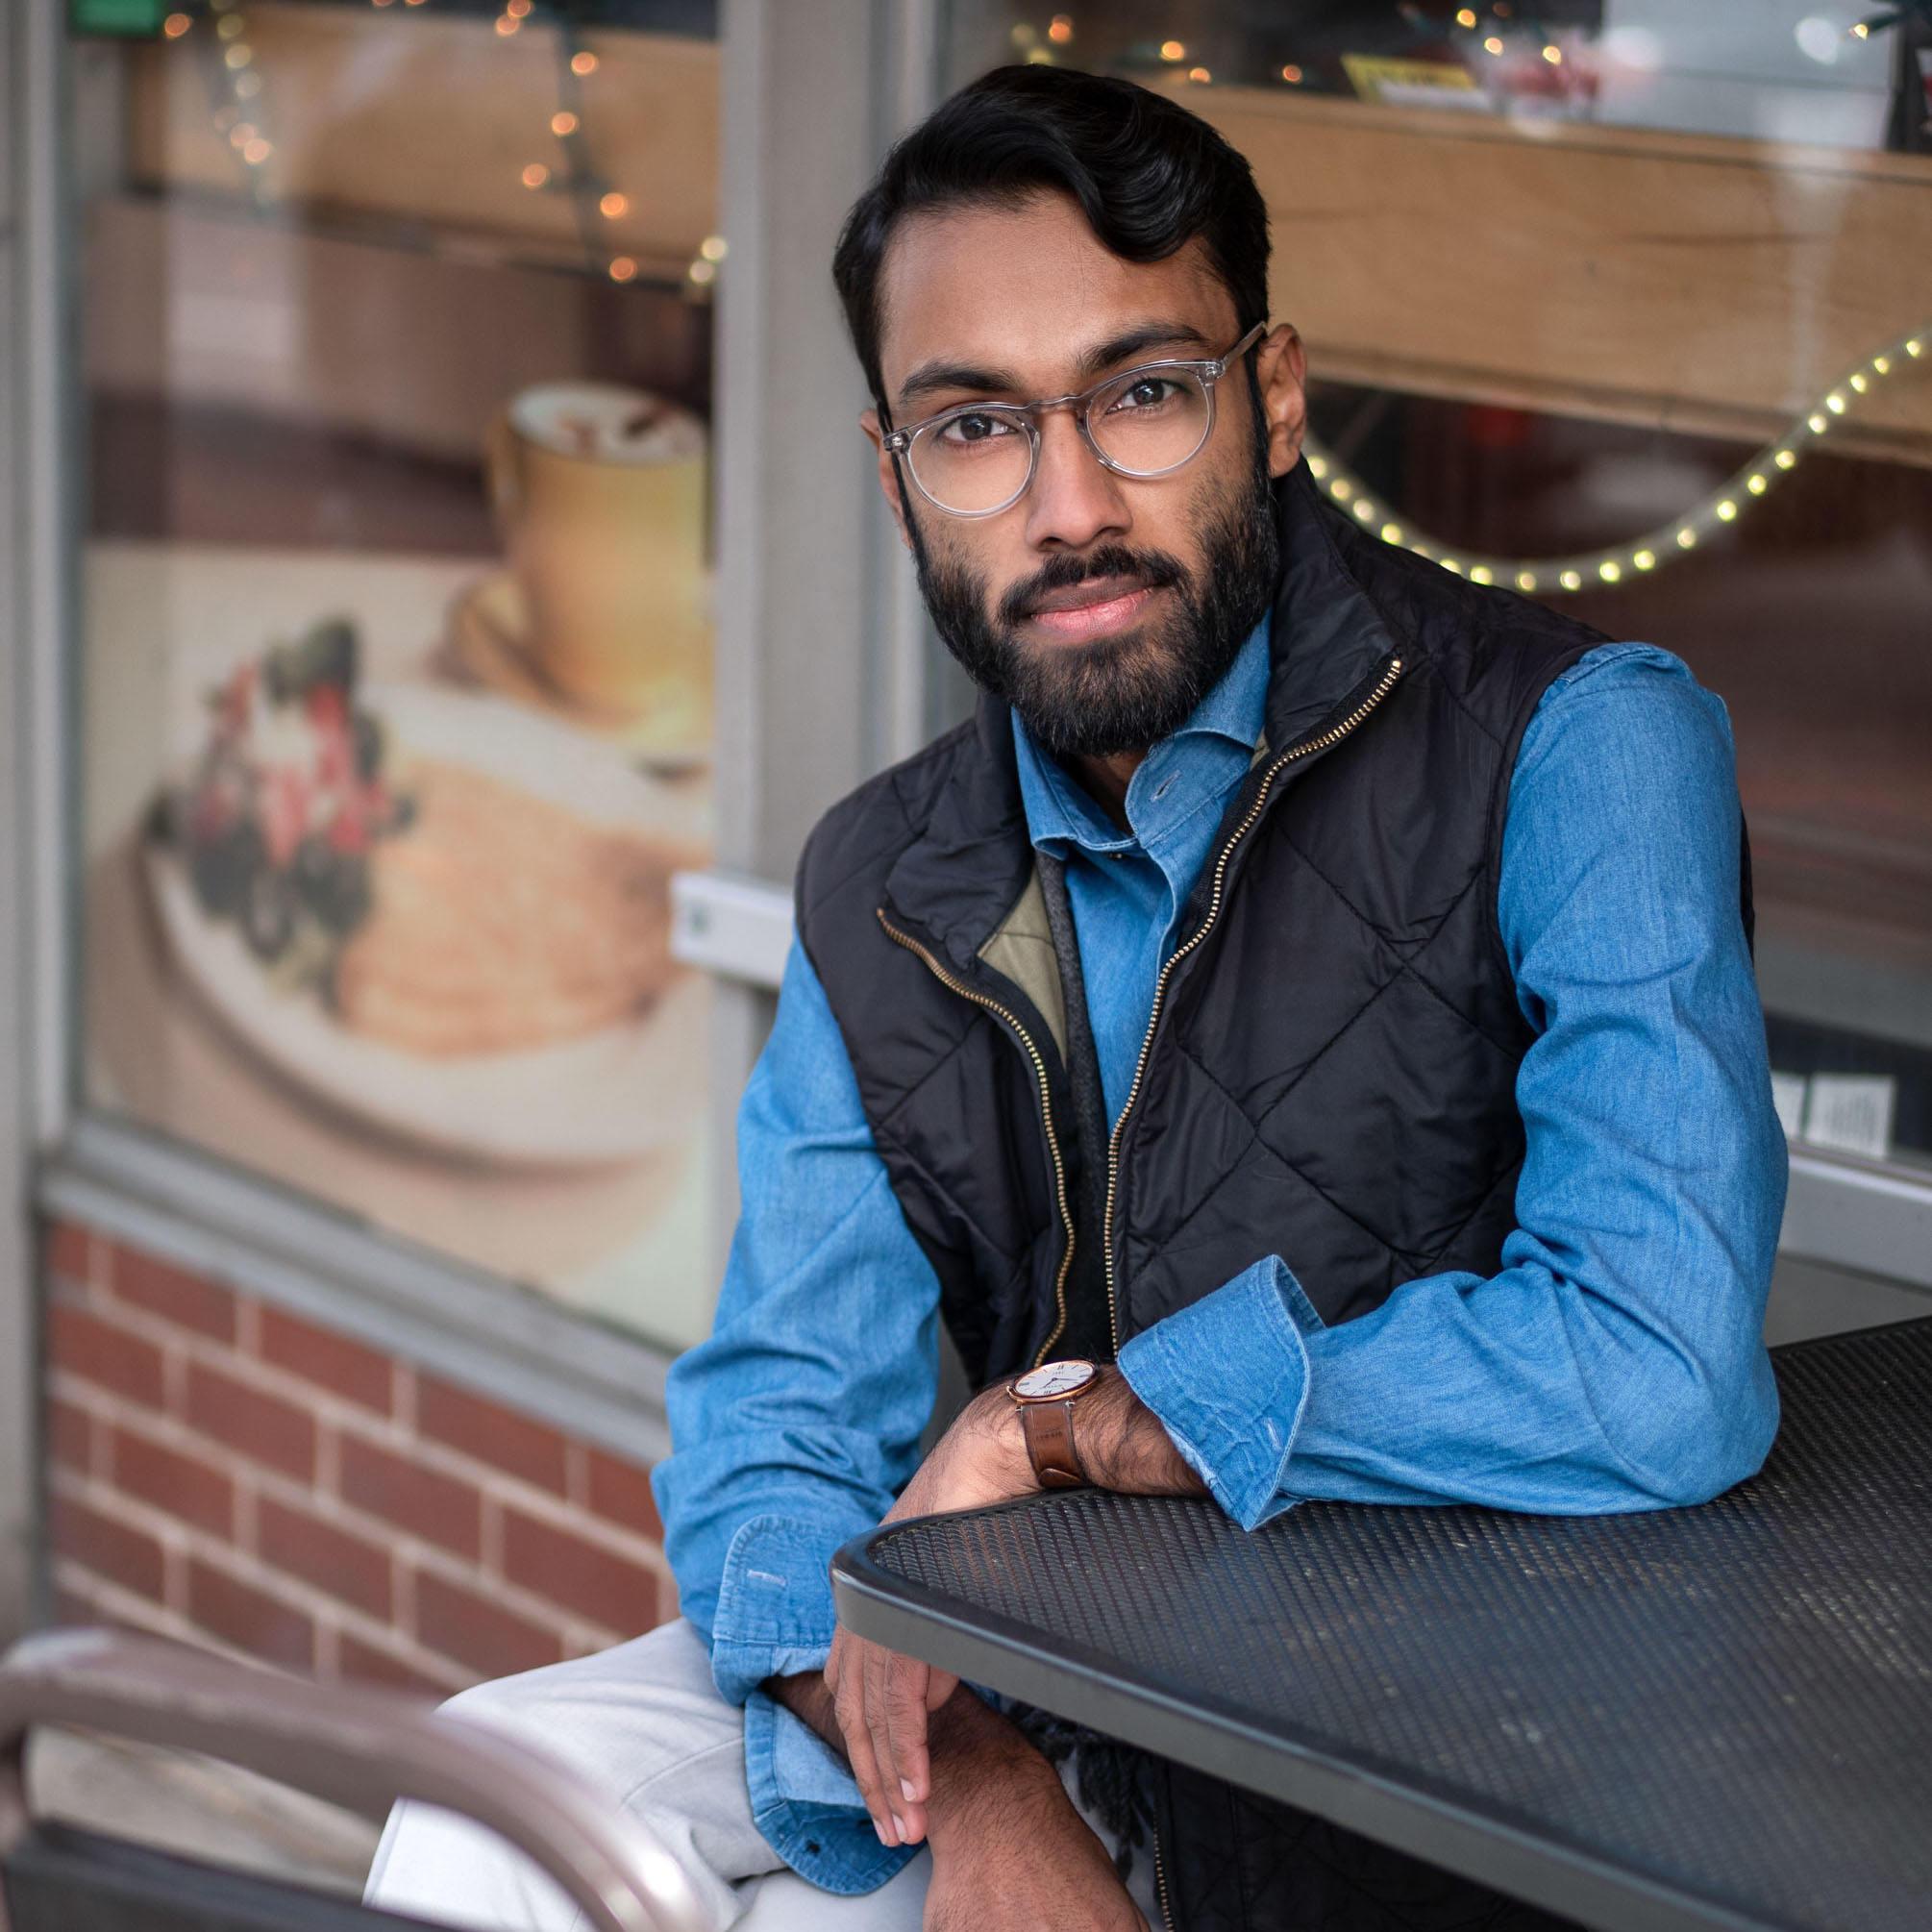 Rajesh wearing blue shirt and black vest